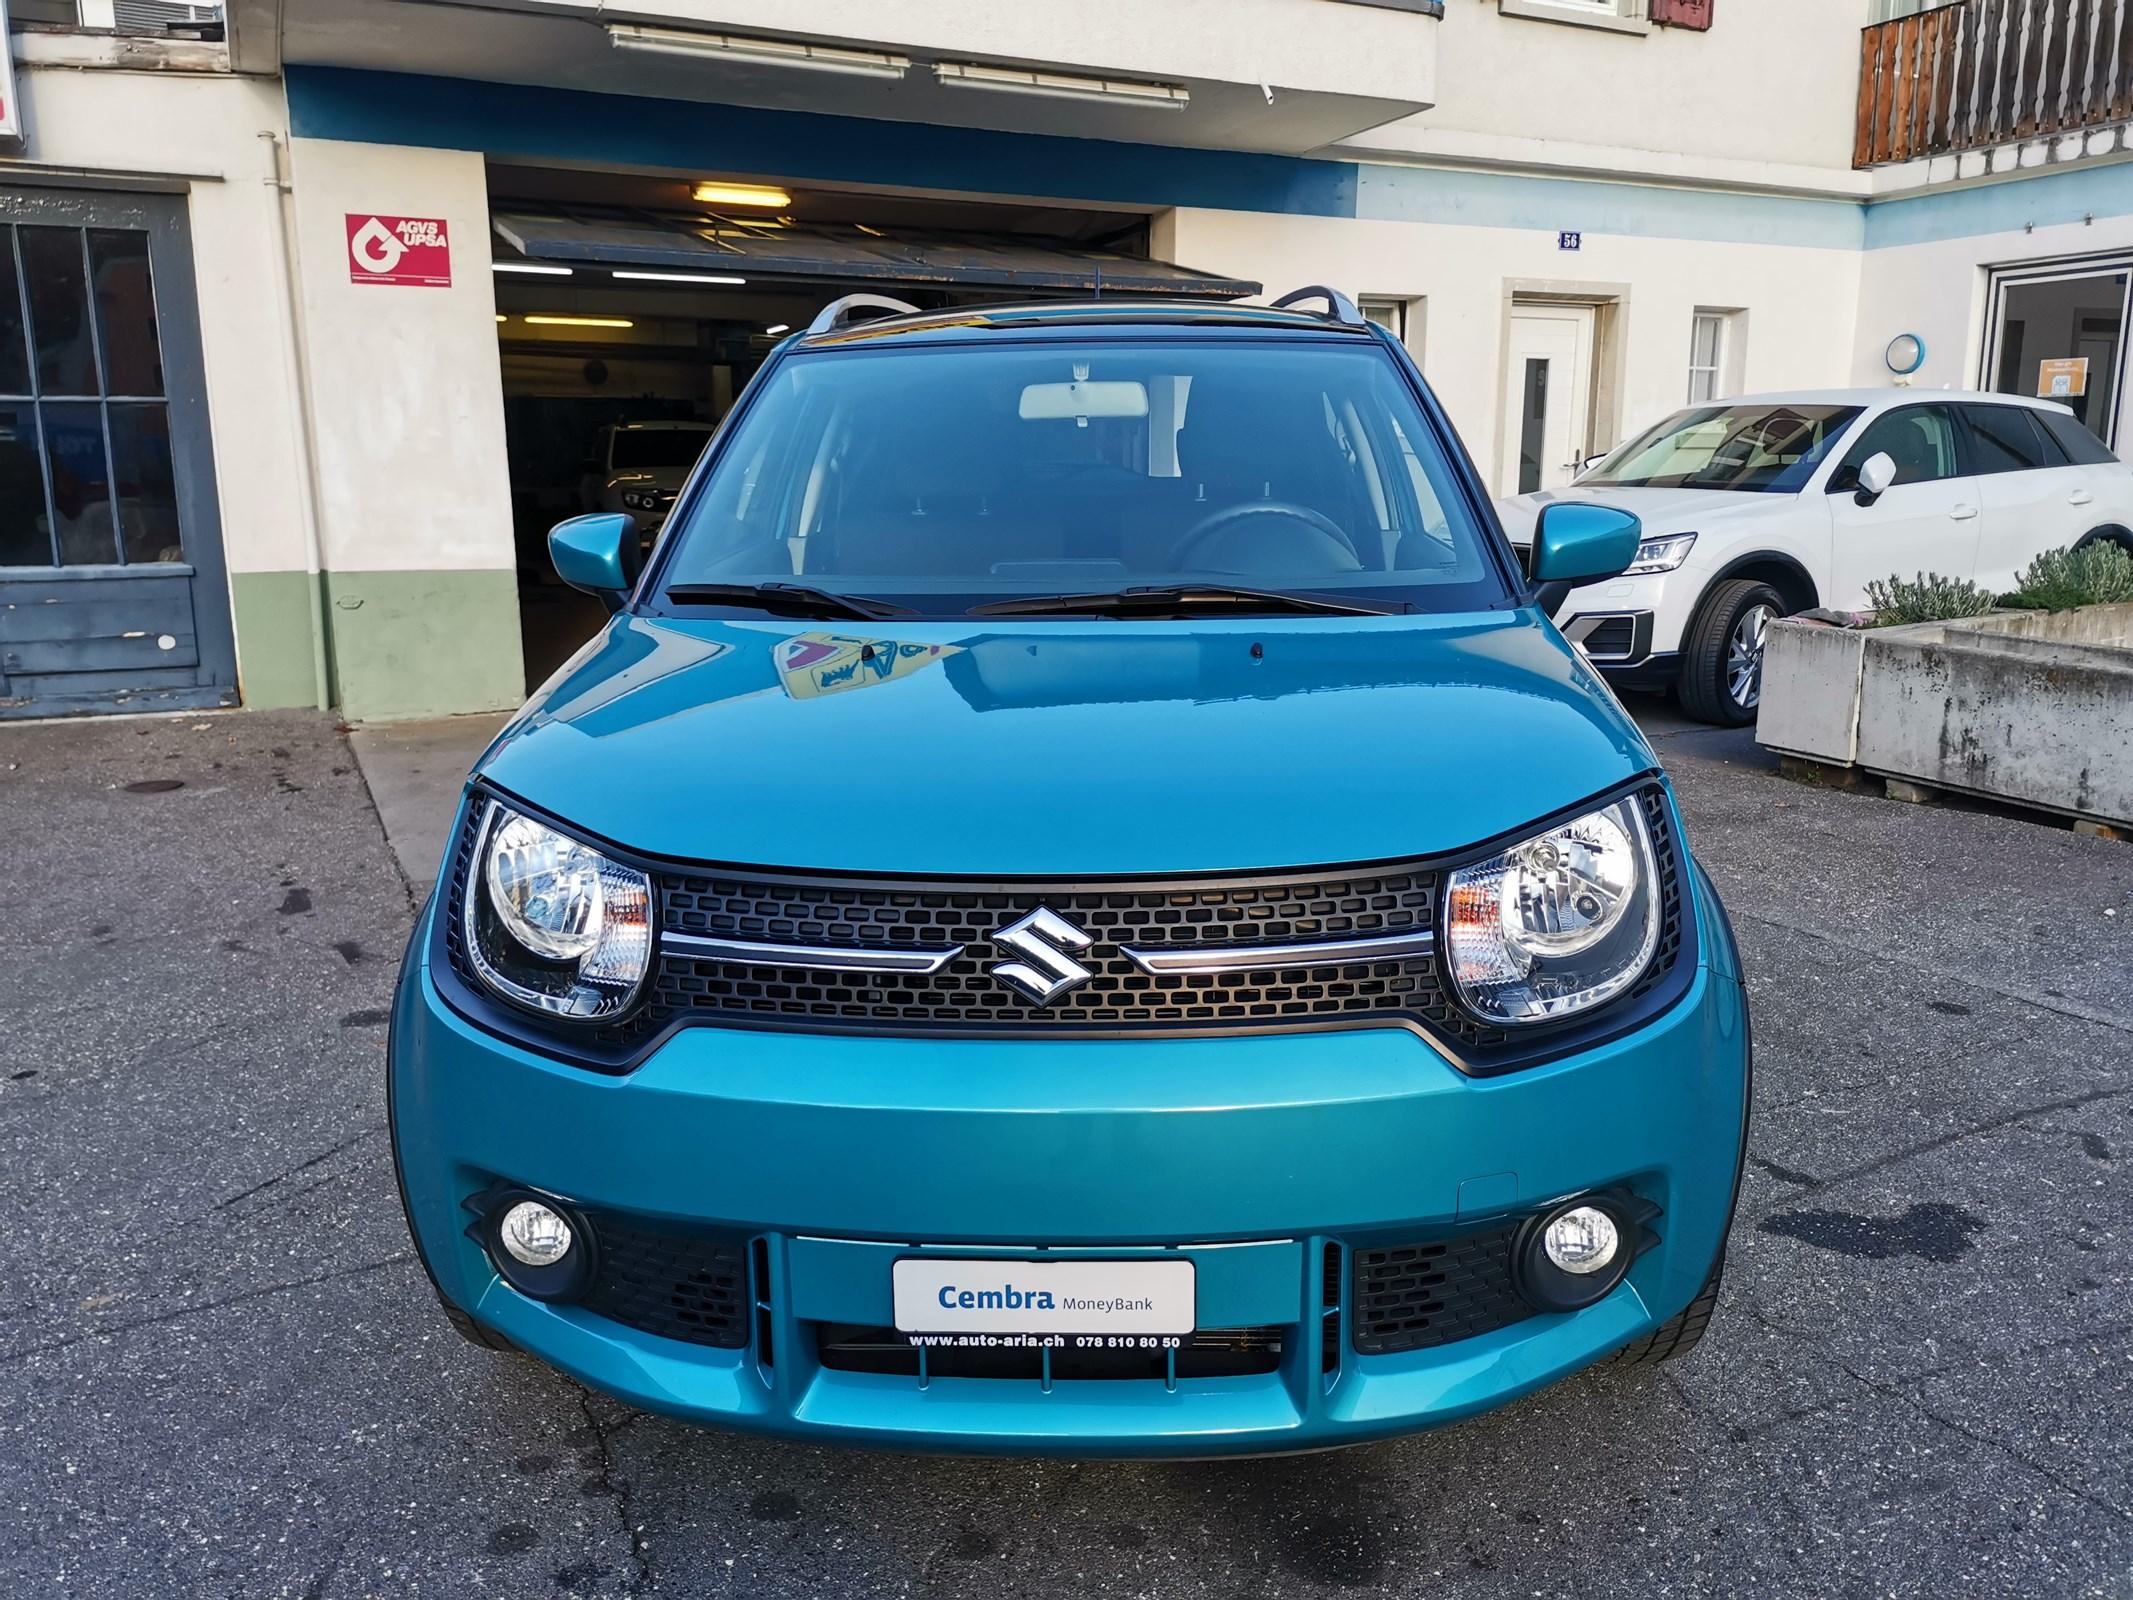 suv Suzuki Ignis 1.2i Compact Top 4x4